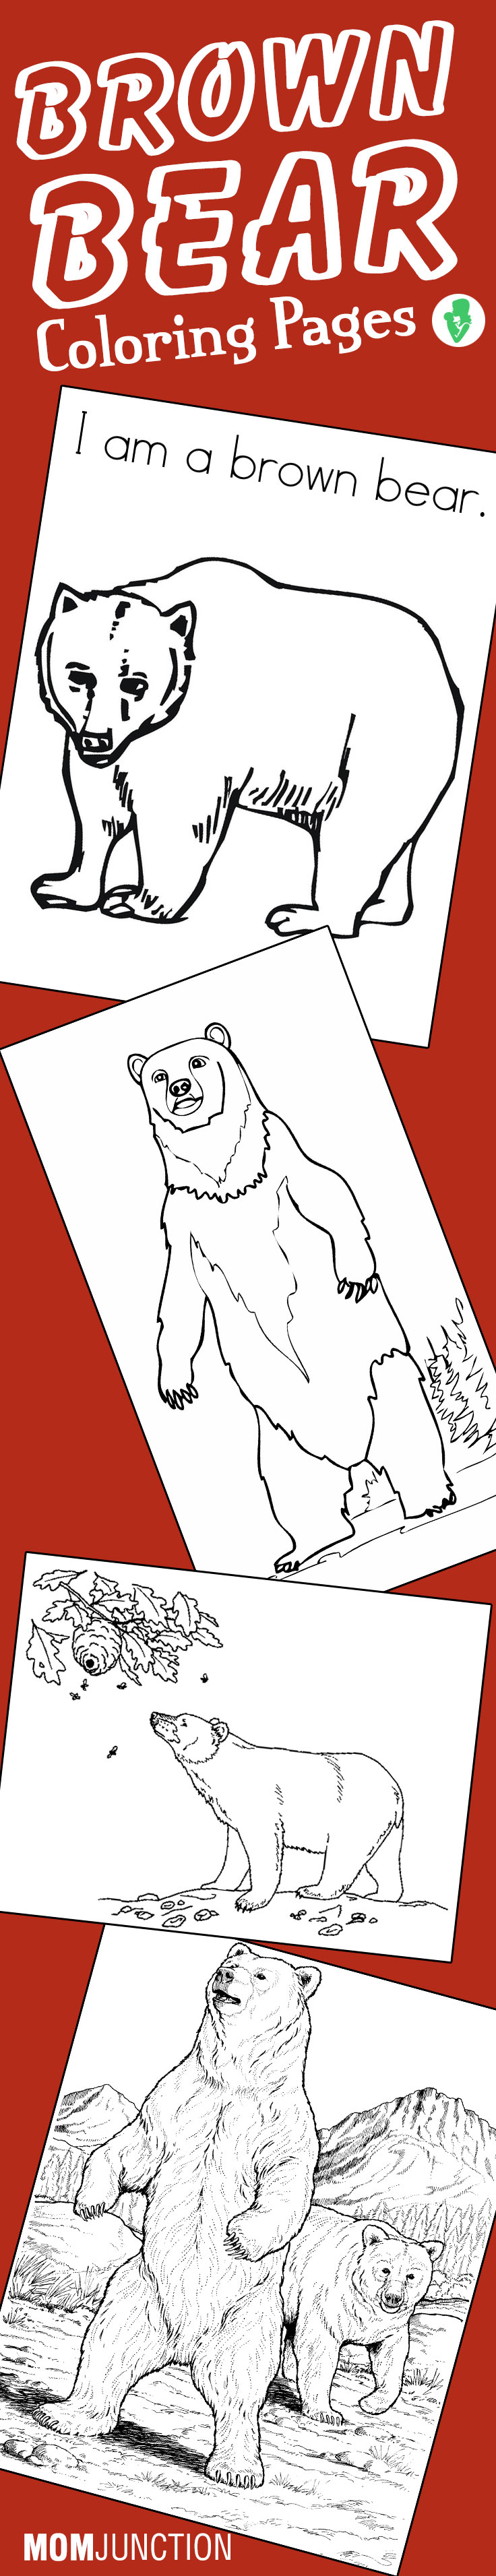 Top 10 Free Printable Brown Bear Coloring Pages Online